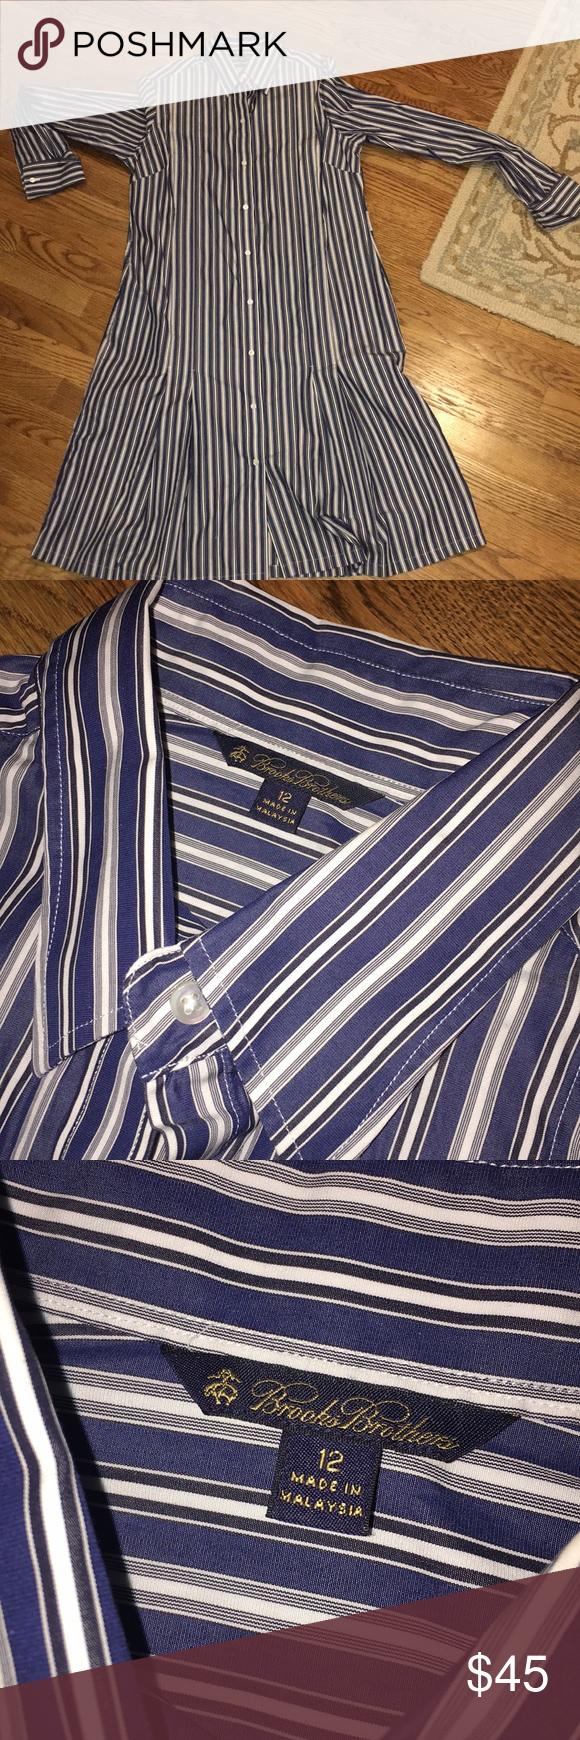 d65388394c15 Brooks Brothers Shirt Dress EUC blue and white striped 100% cotton shirt  dress.